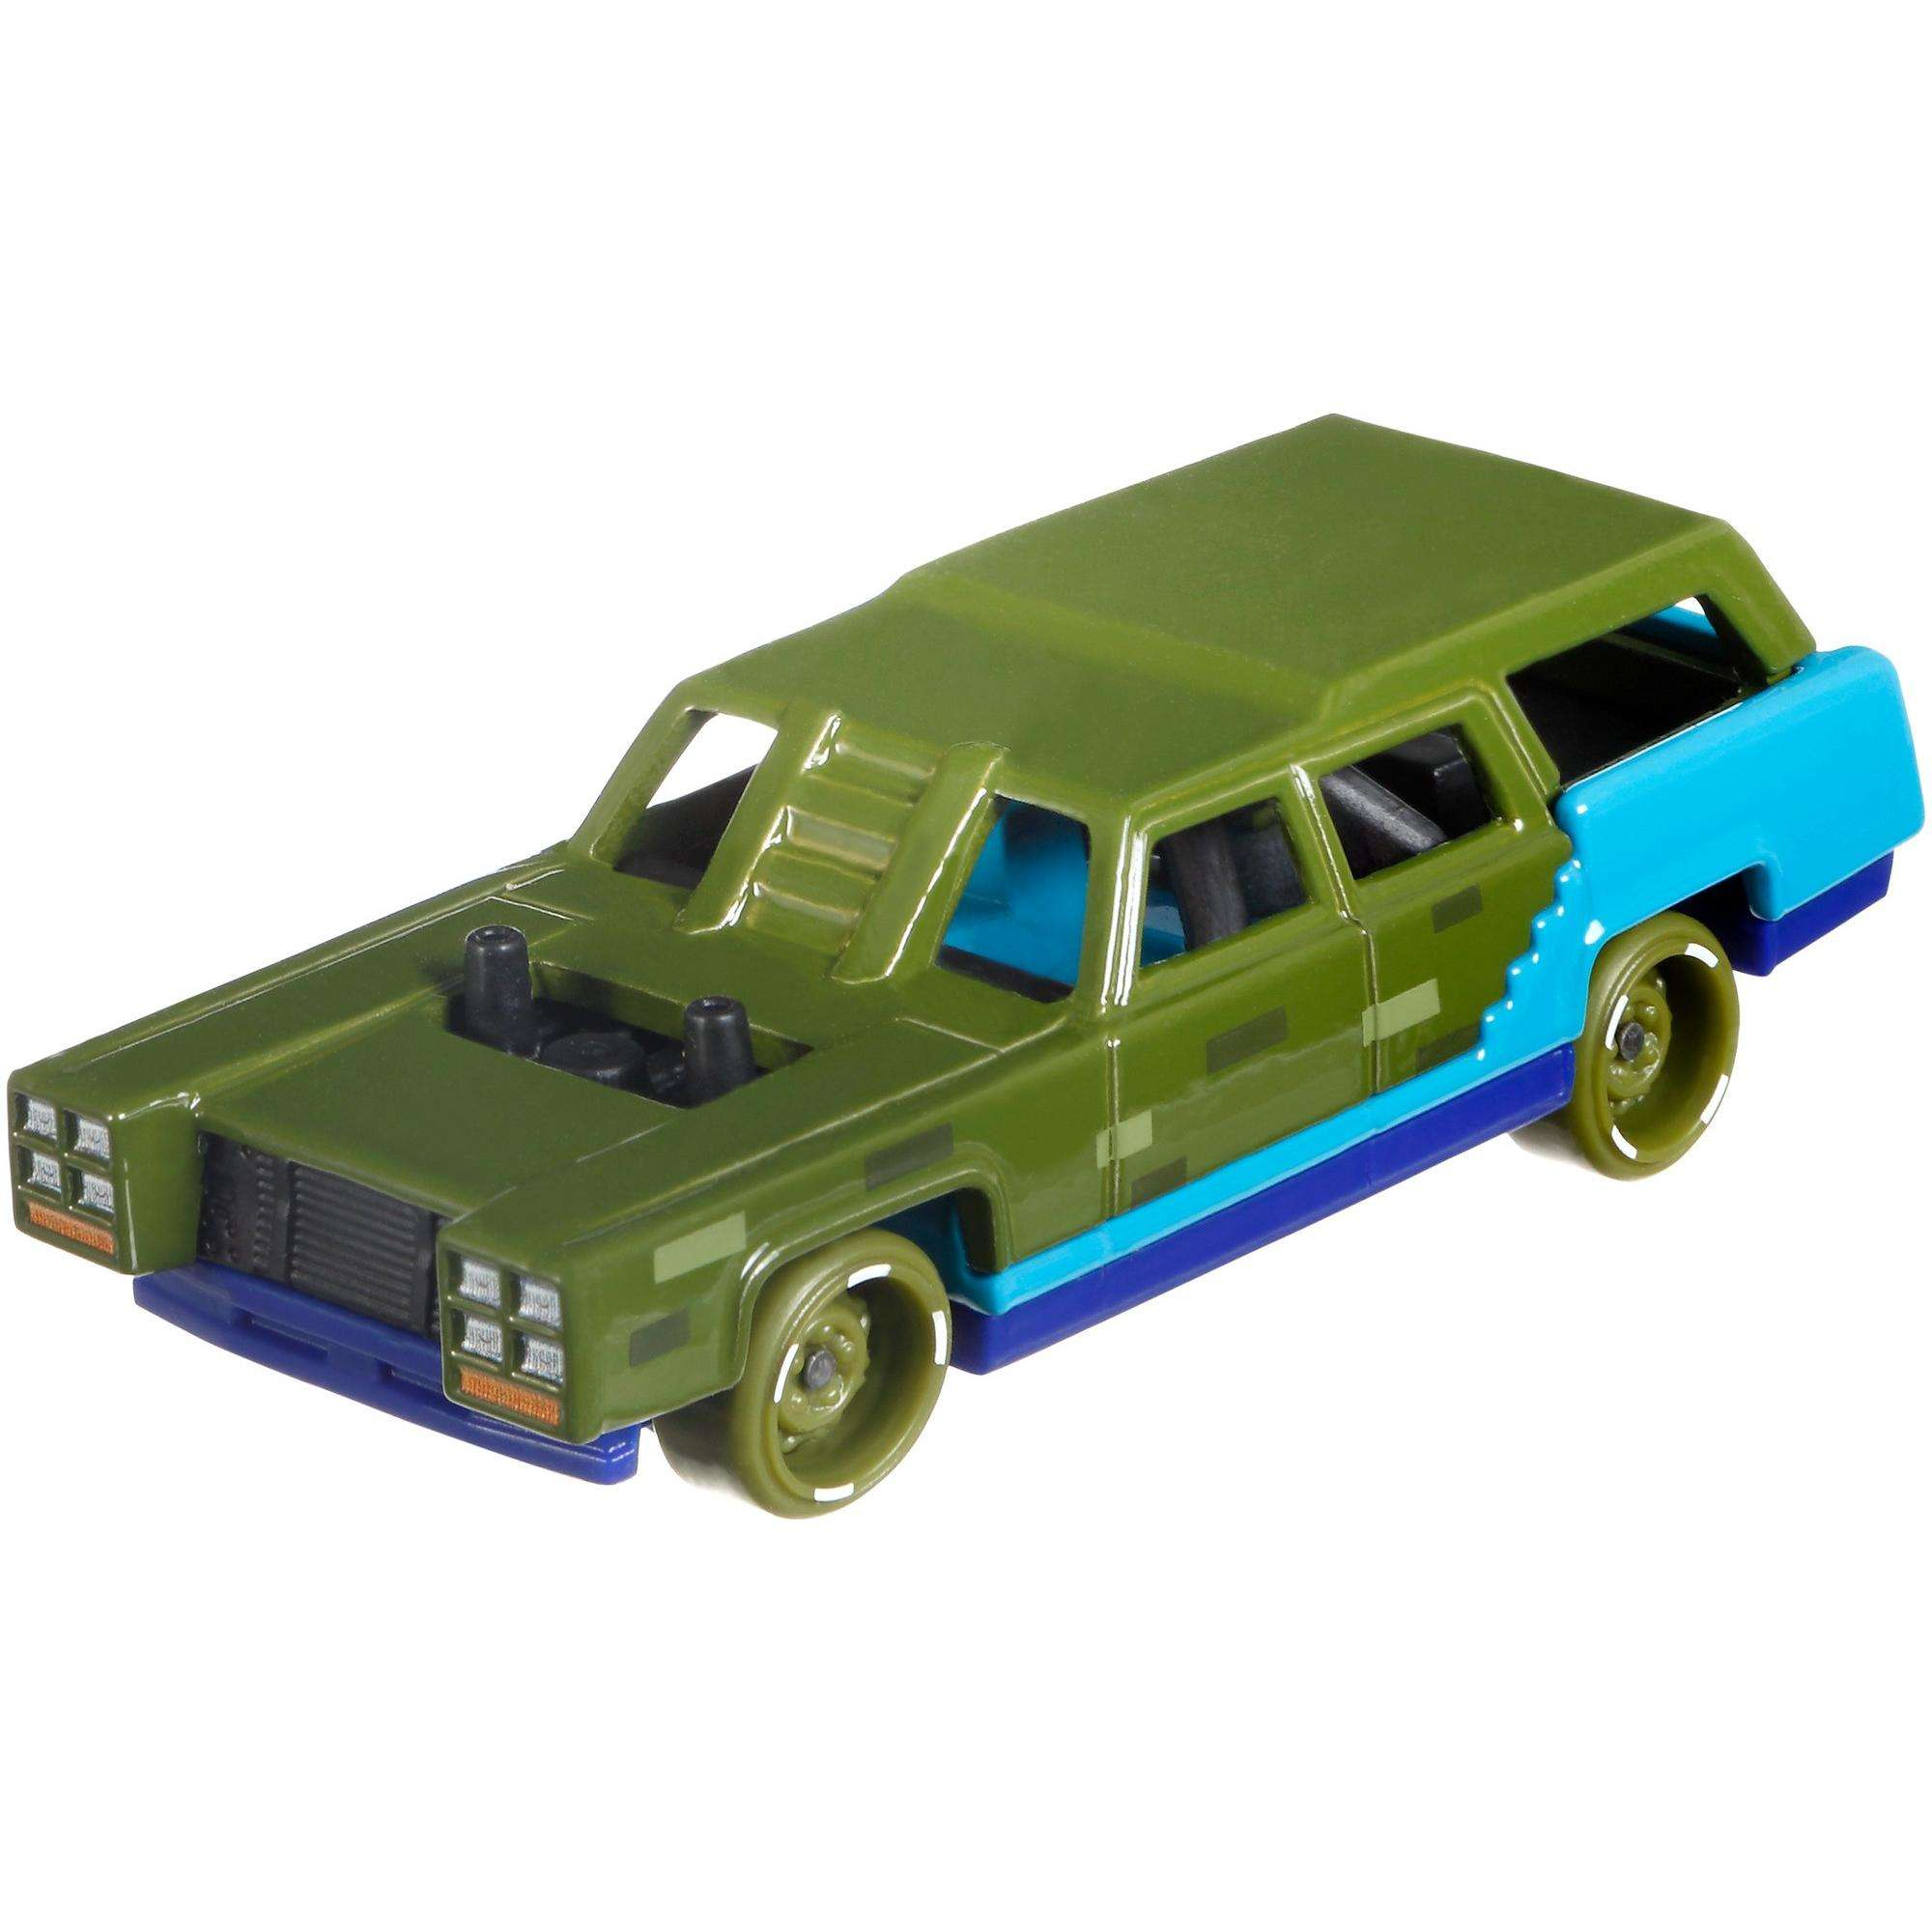 Hot Wheels Minecraft Zombie Vehicle by Mattel